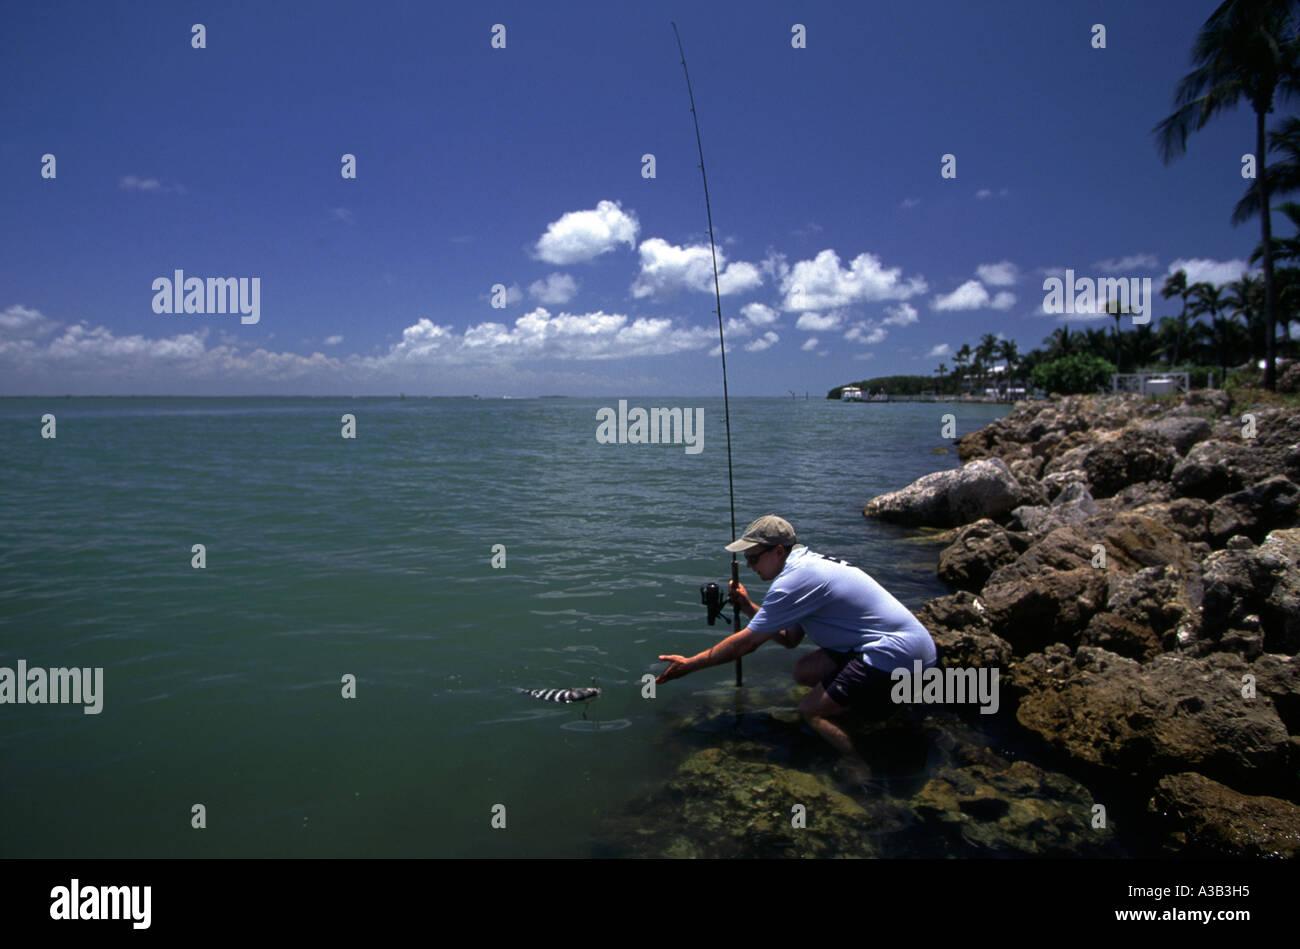 A MAN CATCHES A FISH CAPTIVA ISLAND FLORIDA Stock Photo